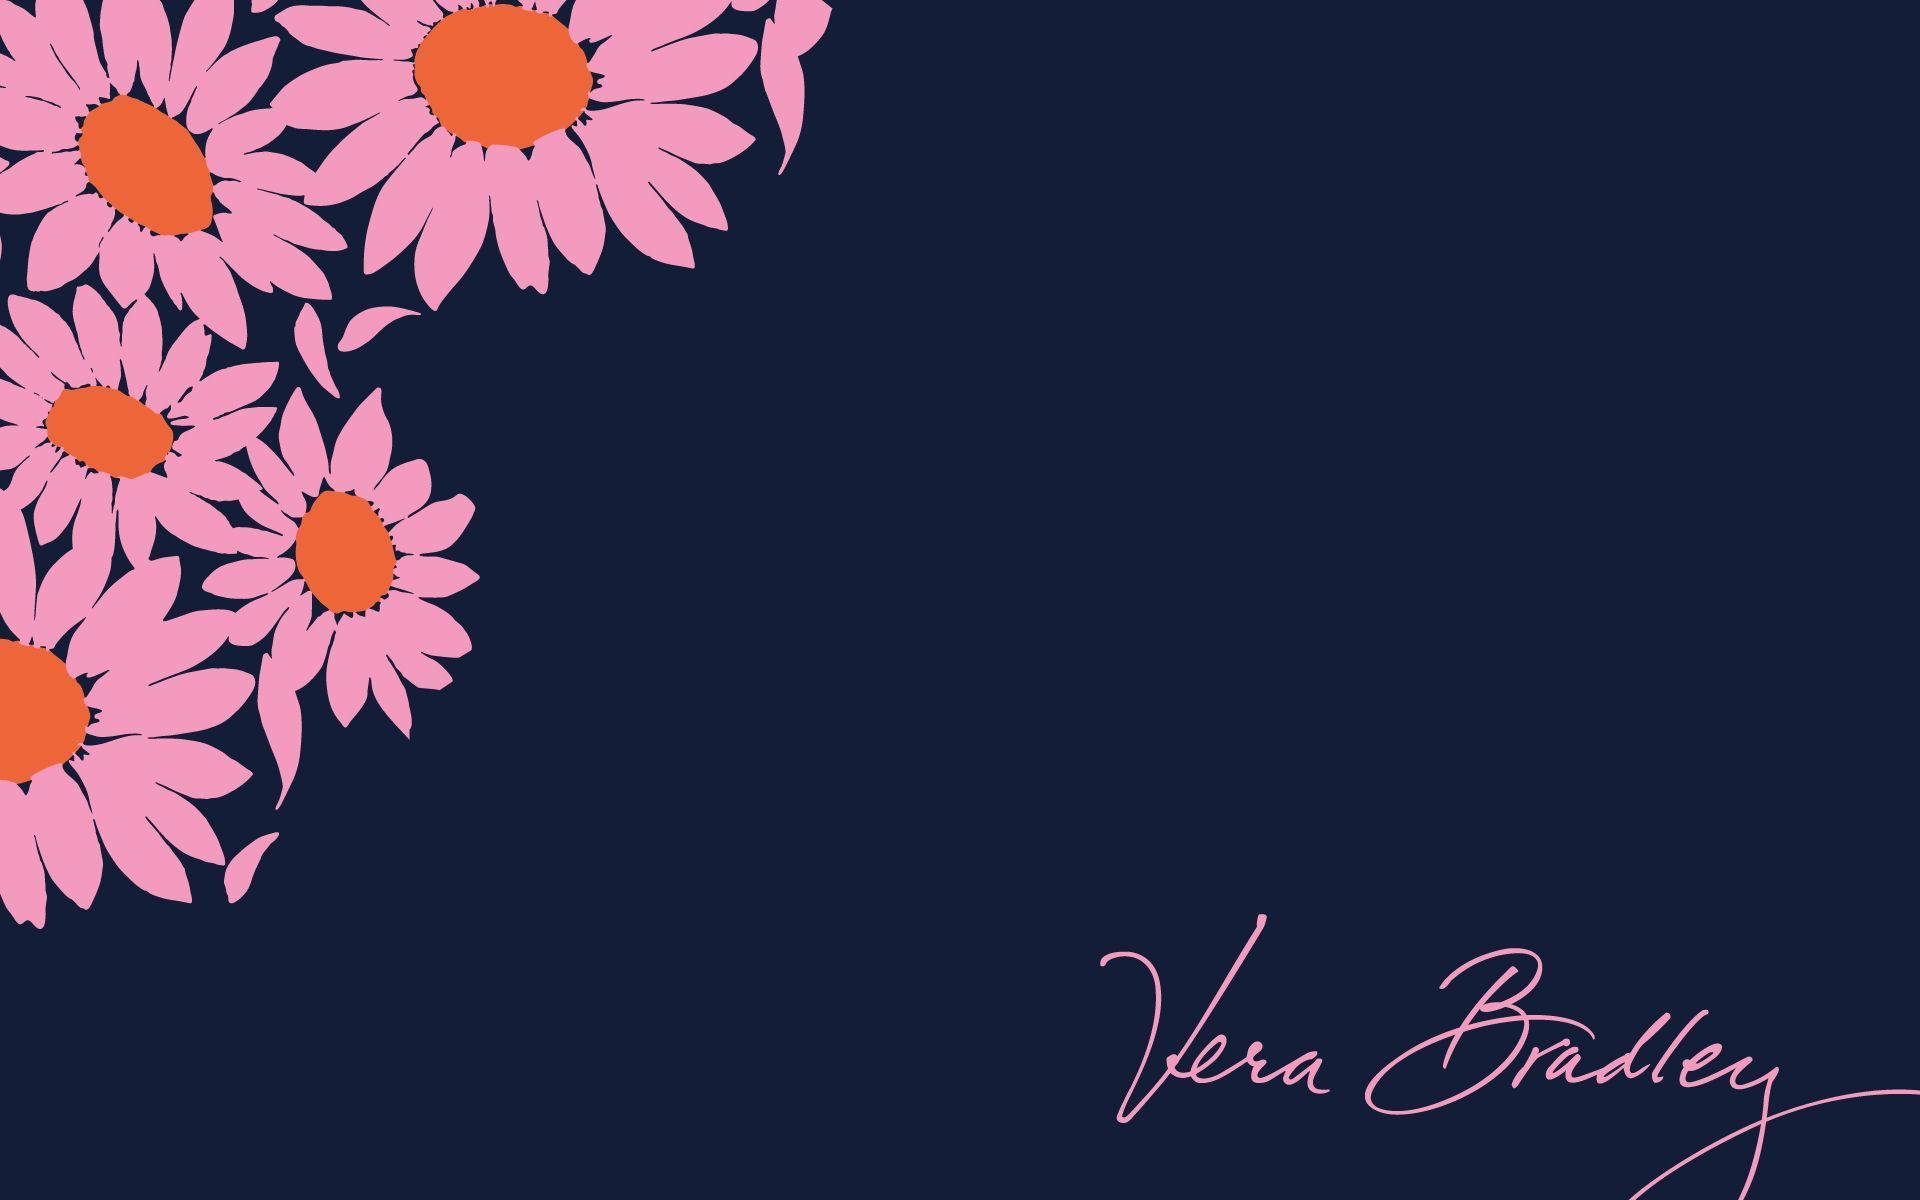 Vera Bradley Desktop Wallpapers Top Free Vera Bradley Desktop